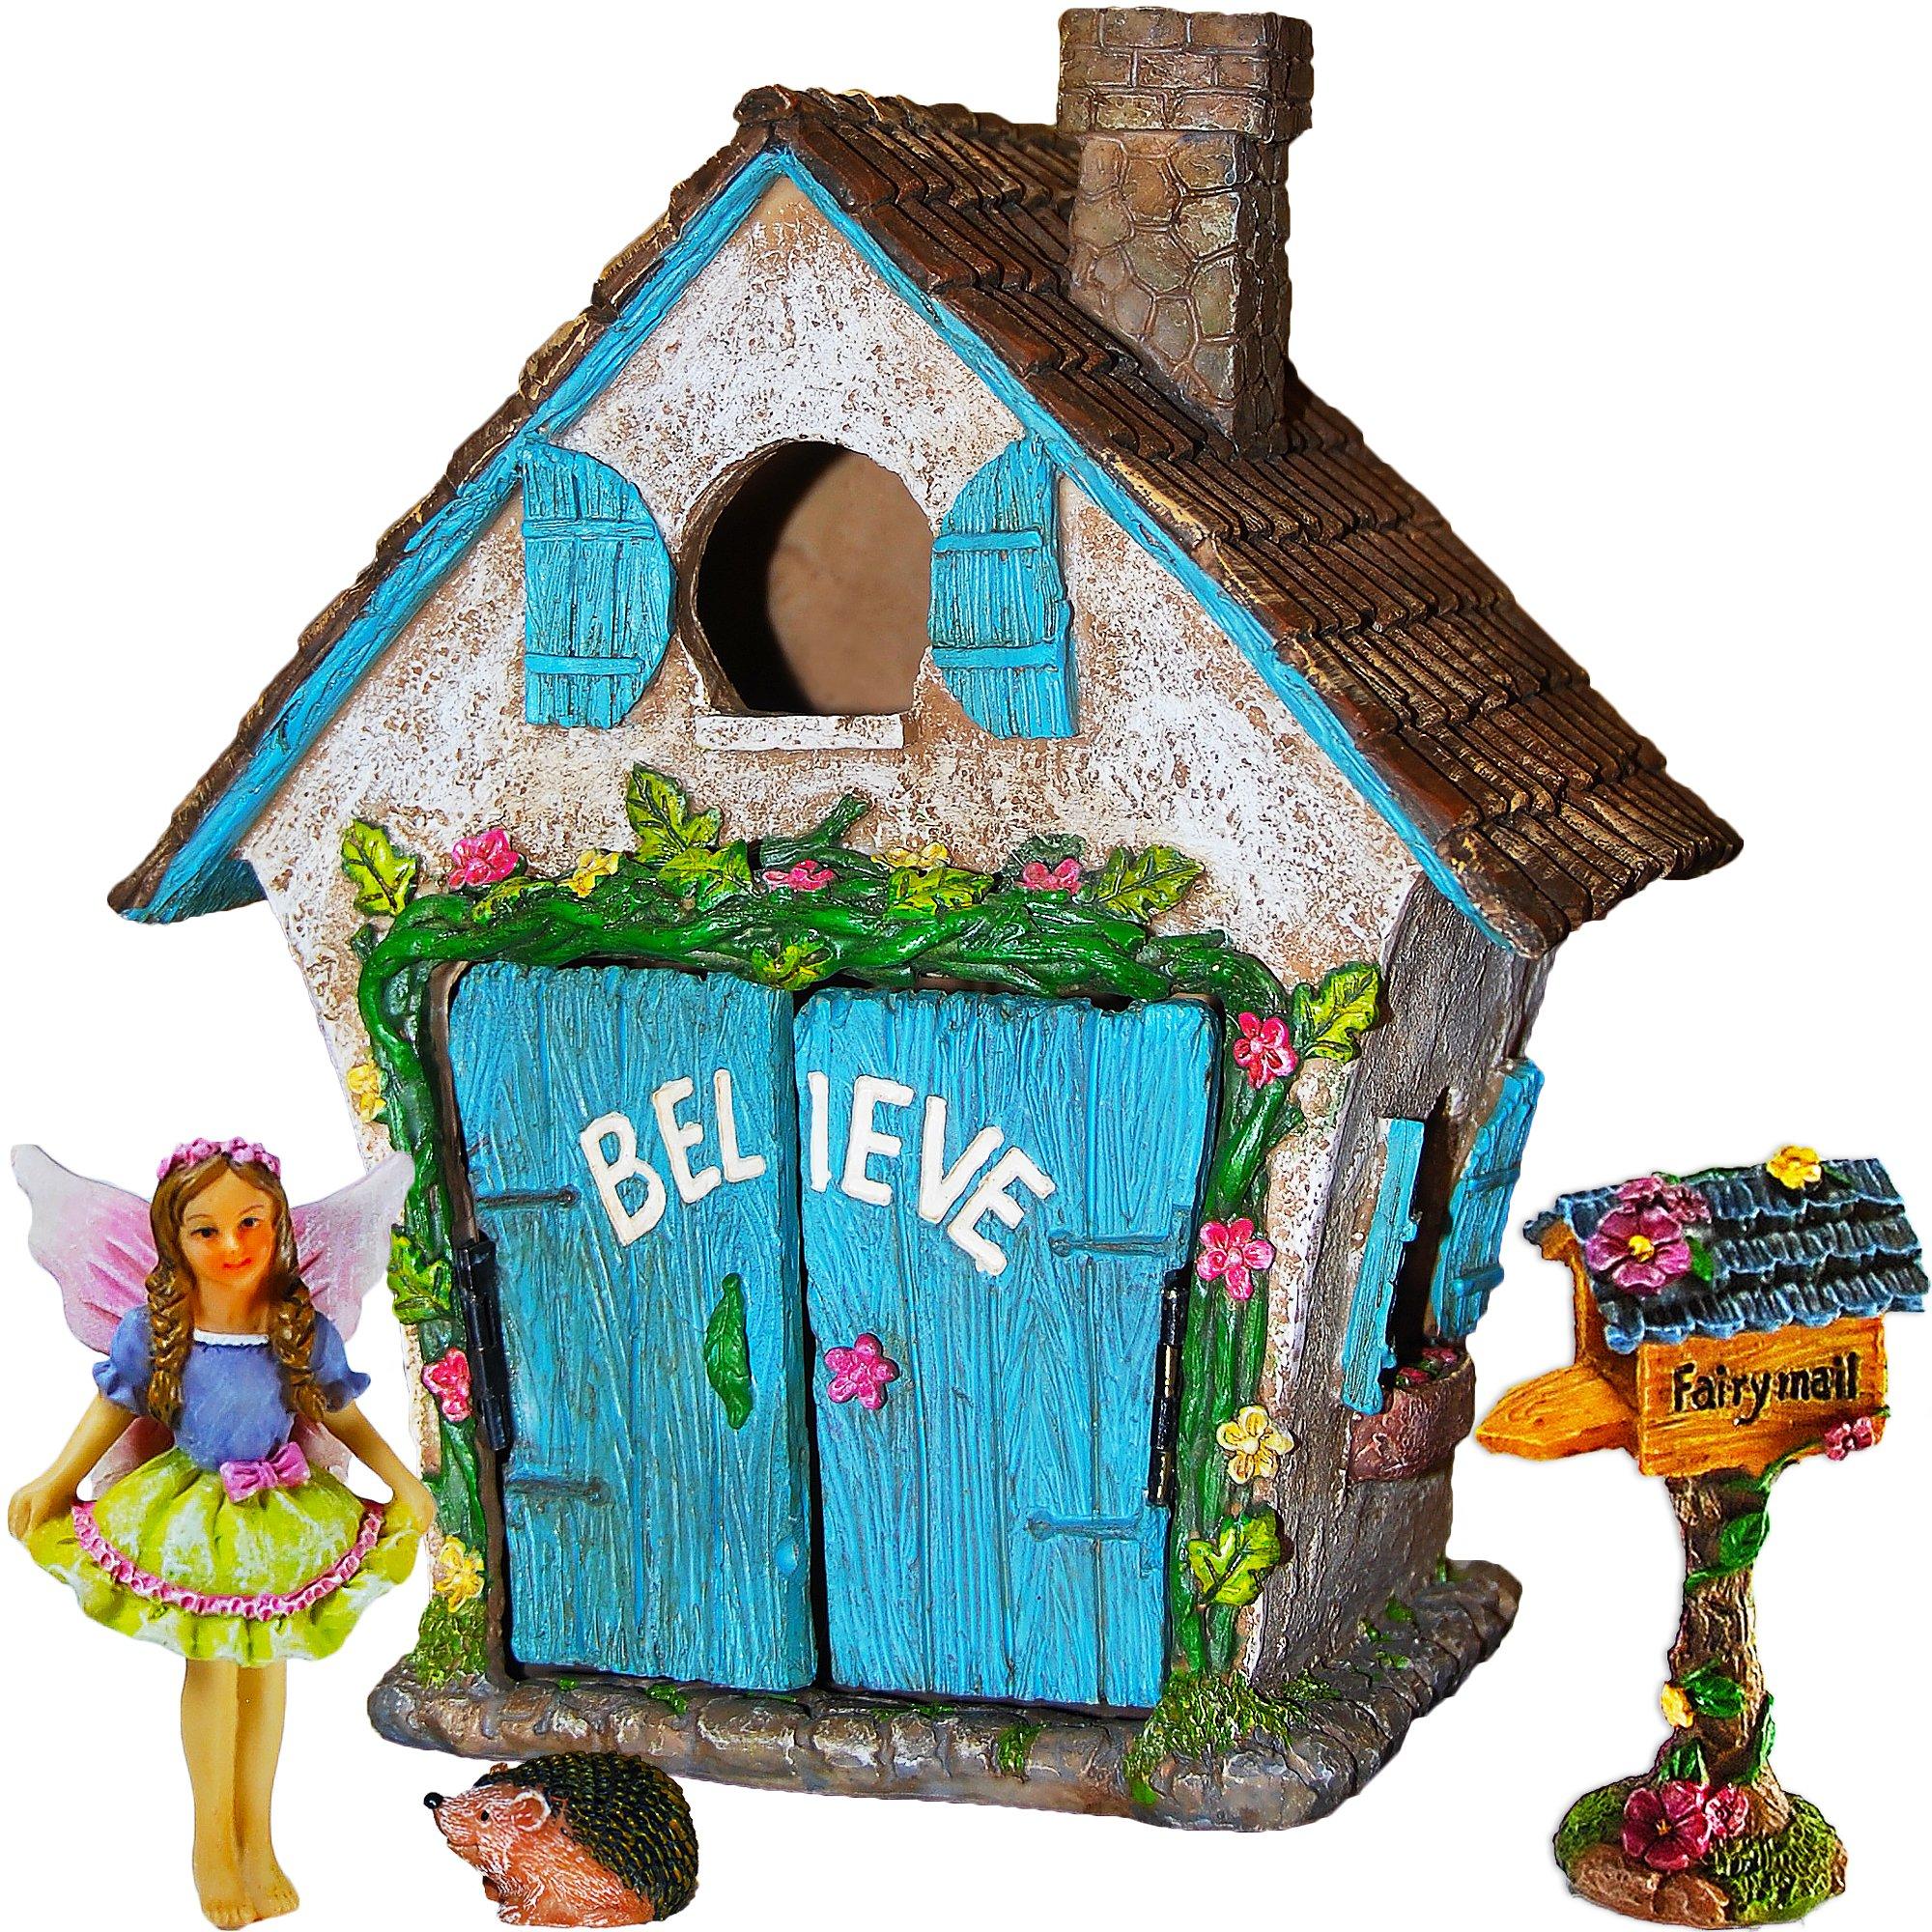 Mood Lab Fairy Garden House Miniature Believe Set of 4 pcs, Hand Painted Figurines & Accessories, Kit Outdoor Indoor Decor